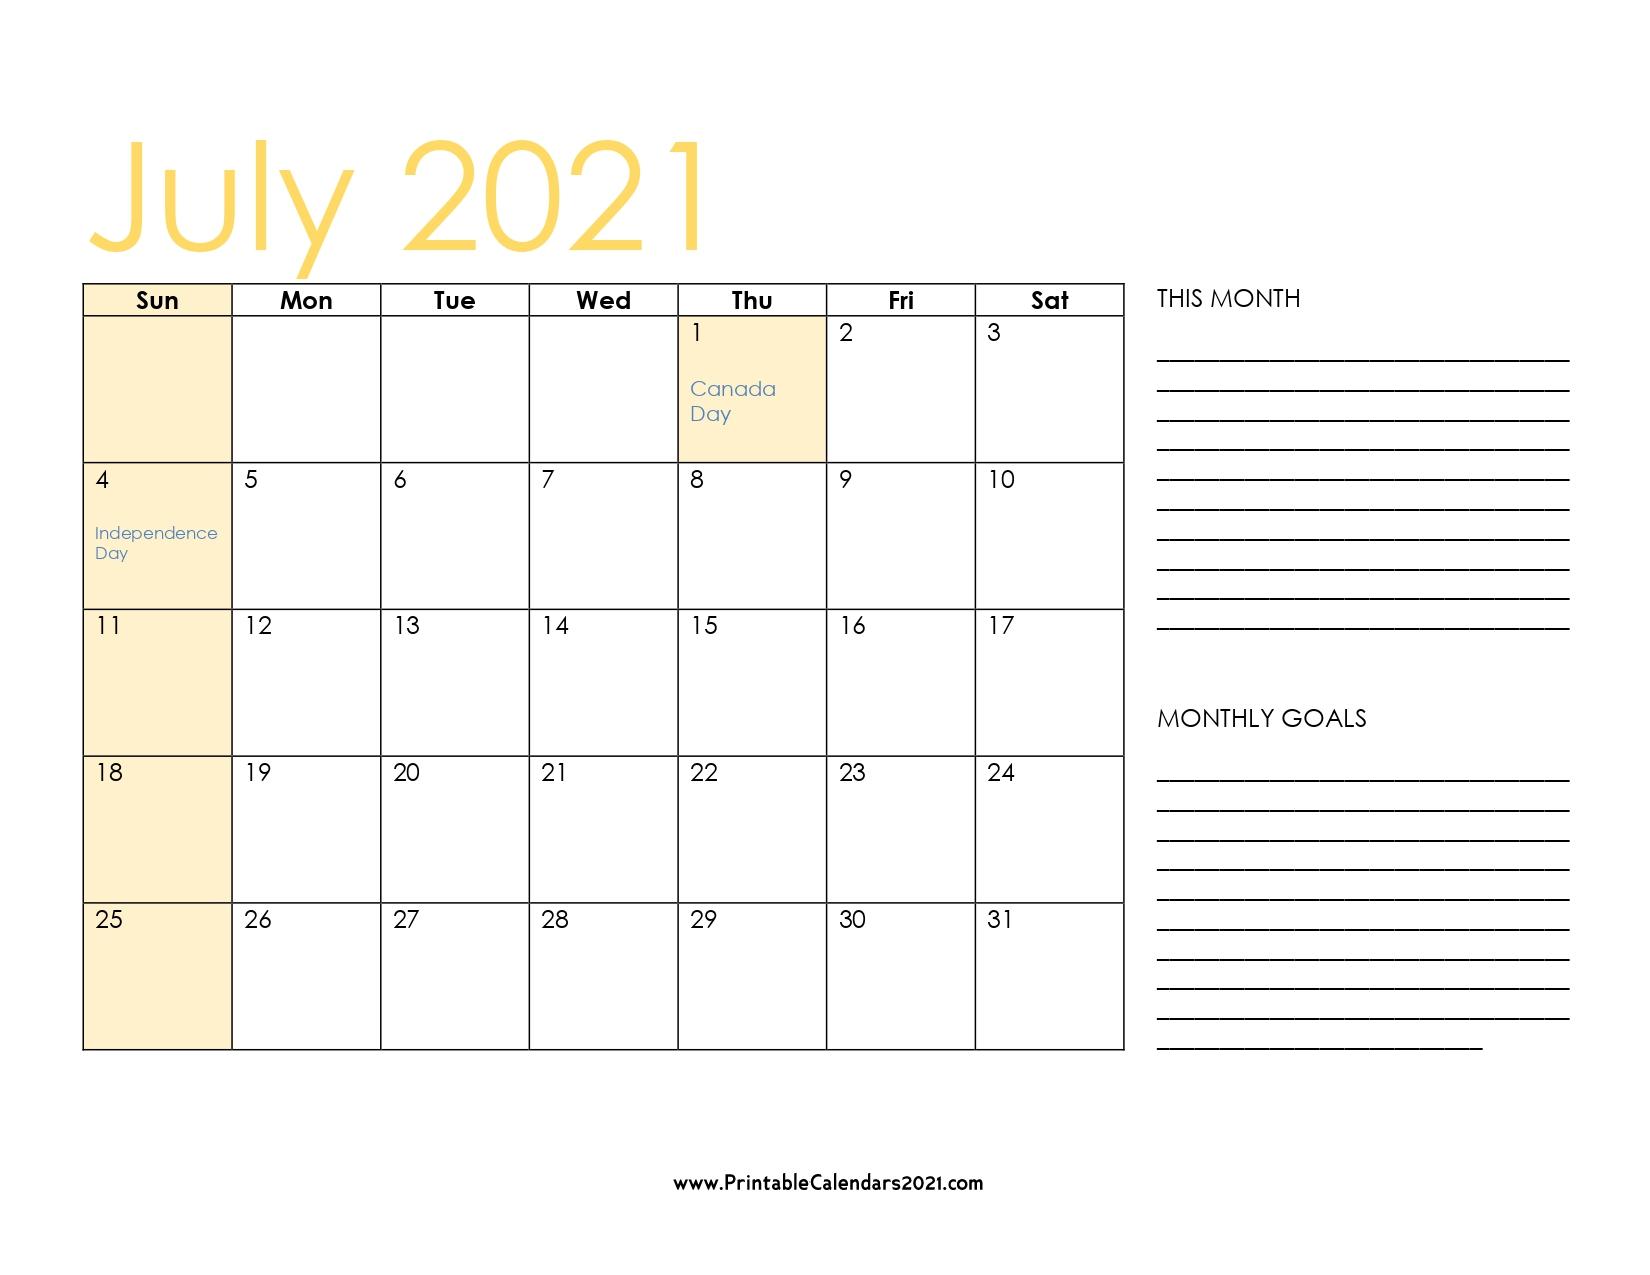 45+ July 2021 Calendar Printable, July 2021 Calendar Pdf throughout Print Free July 2021 Calendar Without Downloading